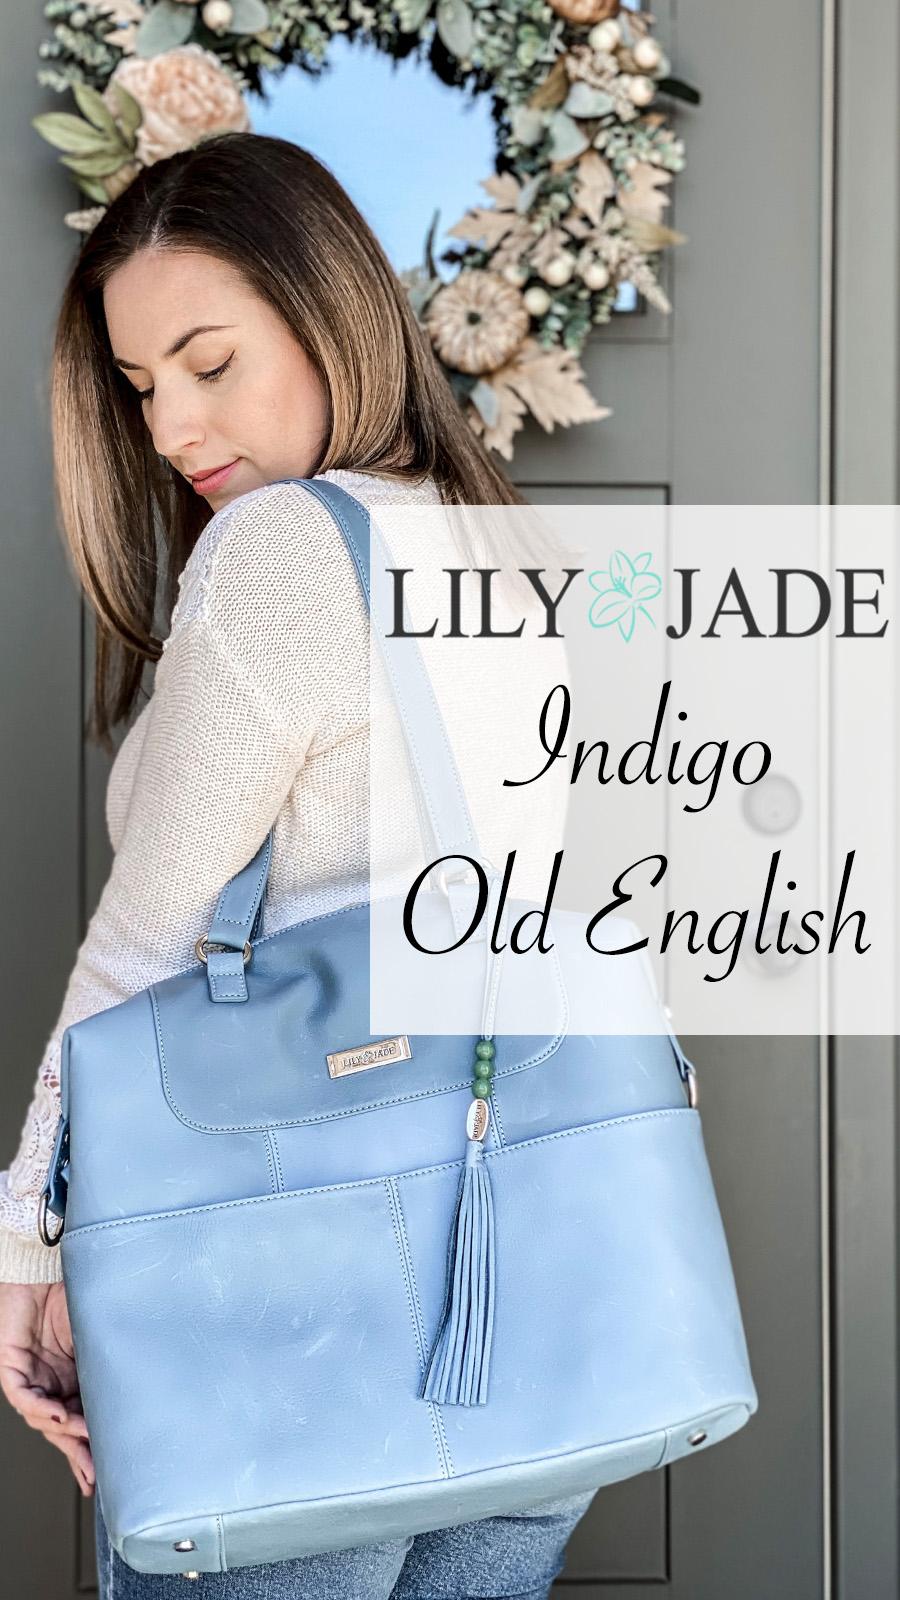 Lily Jade Old English Indigo pinterest.